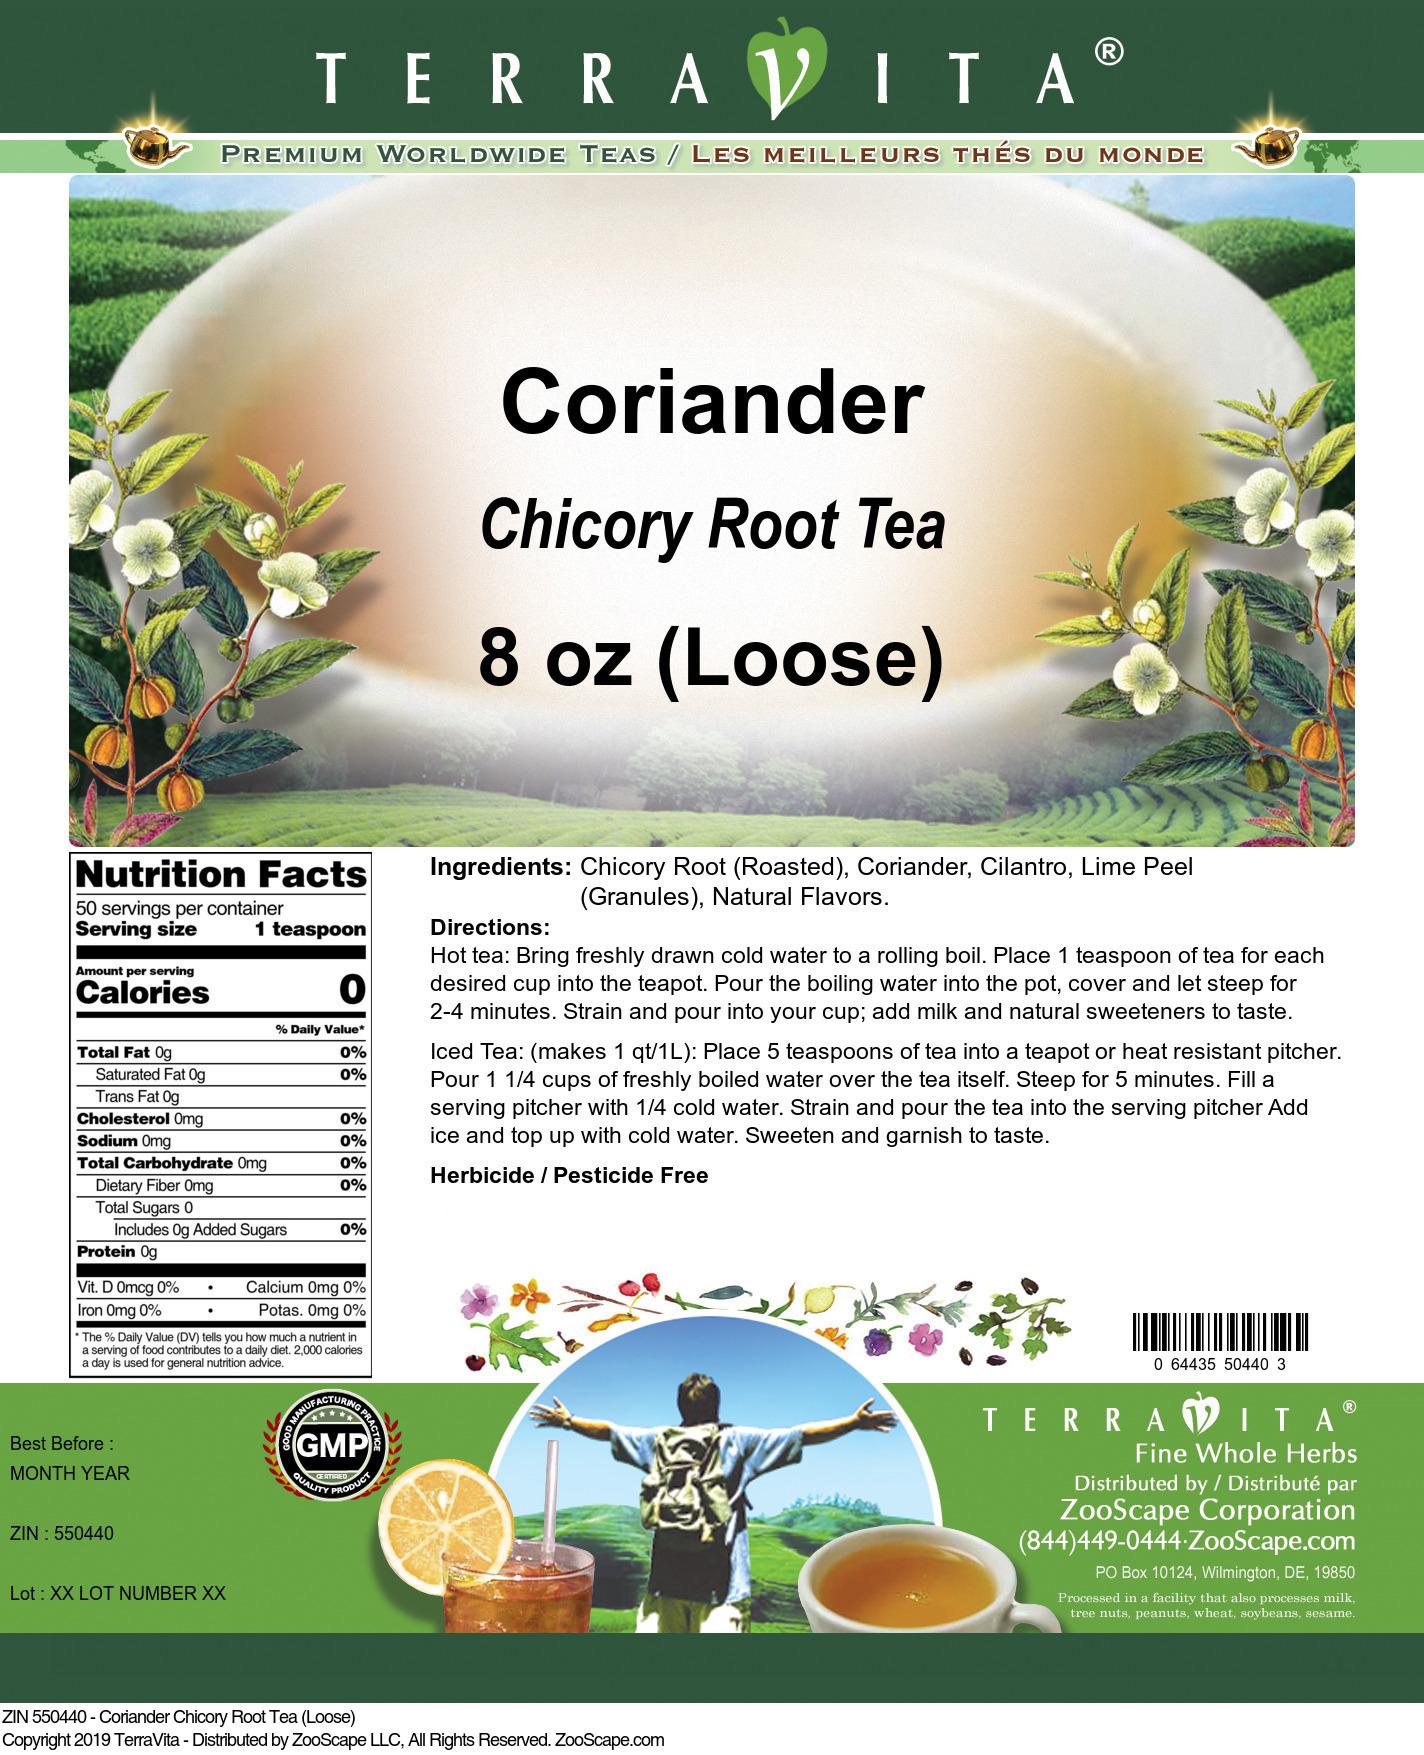 Coriander Chicory Root Tea (Loose)